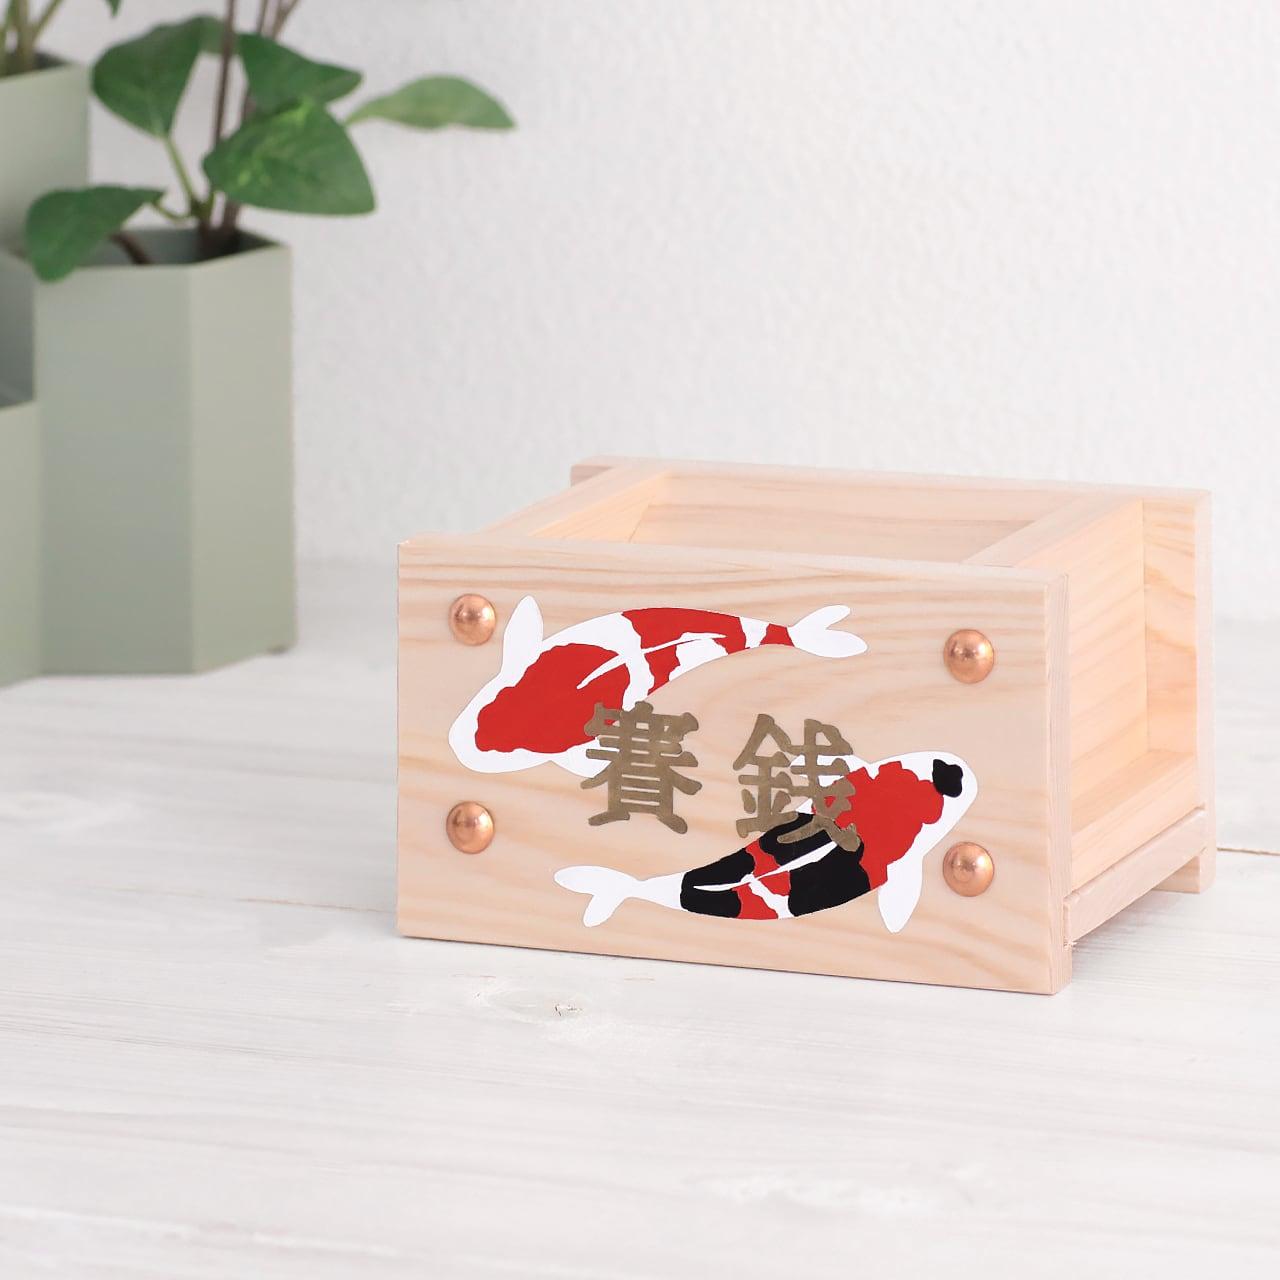 和彩 絵付け 賽銭箱 錦鯉 小型